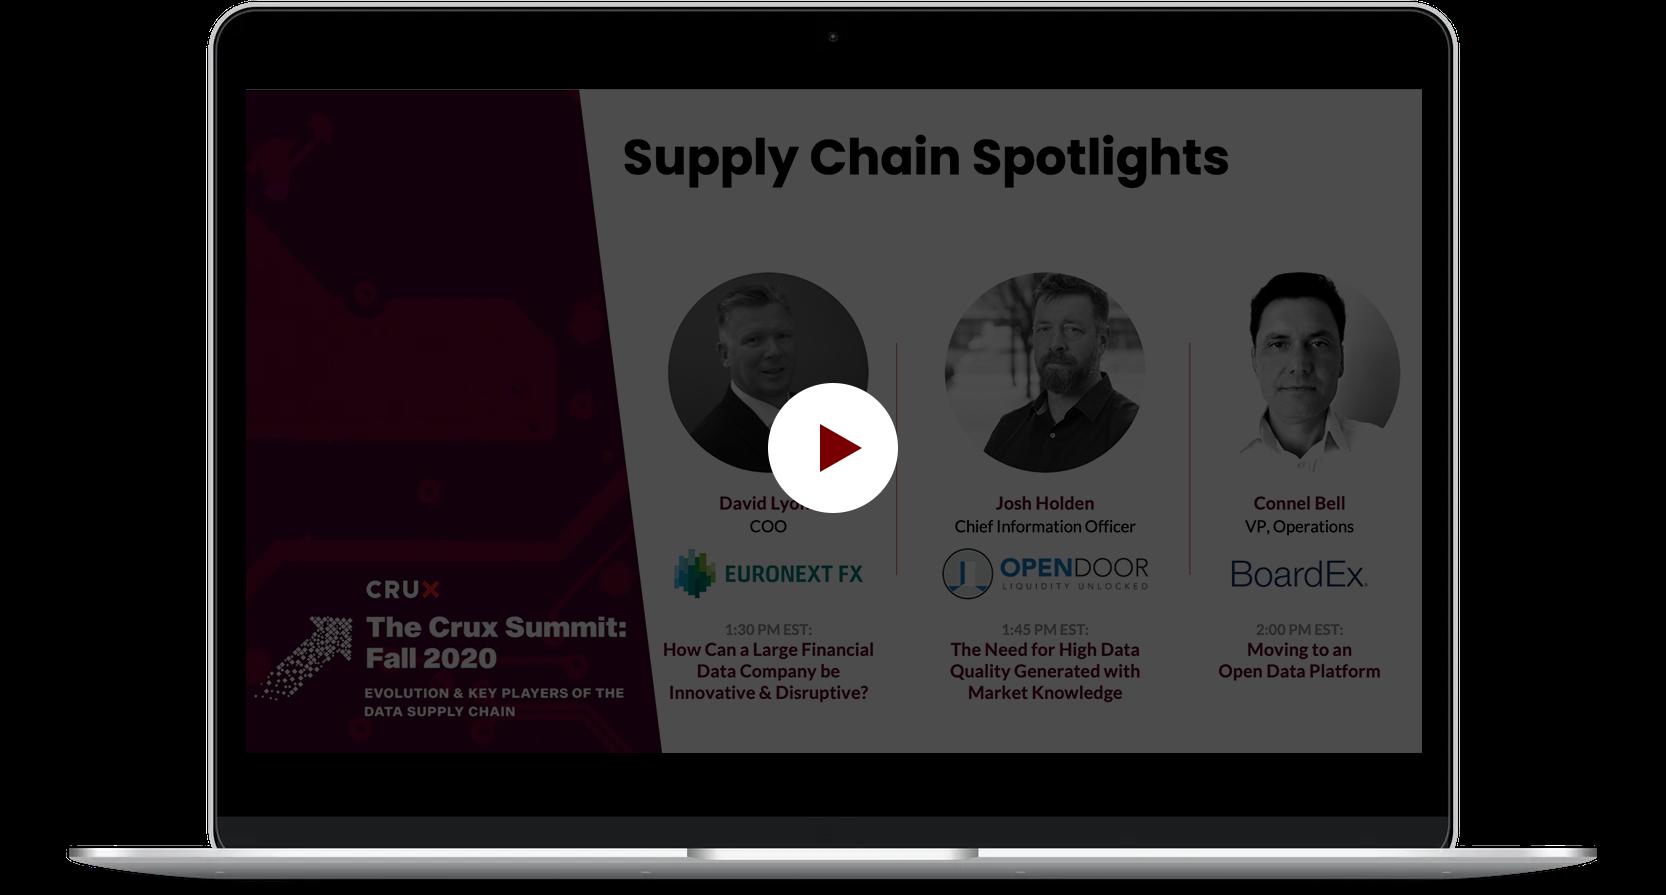 Crux_TCS_SupplyChainSpotlights_06